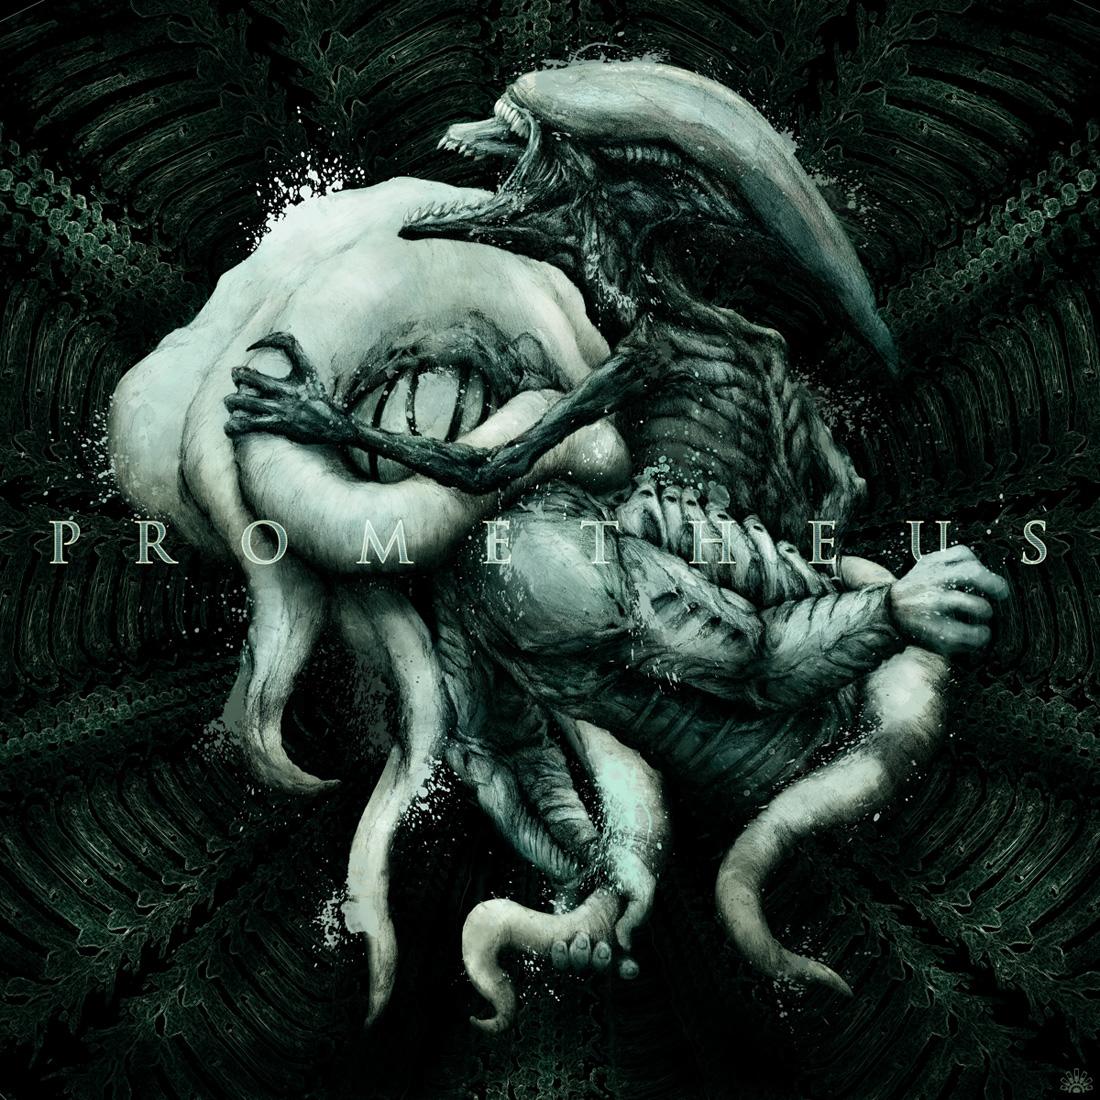 Prometheus Illustrative Poster on Behance